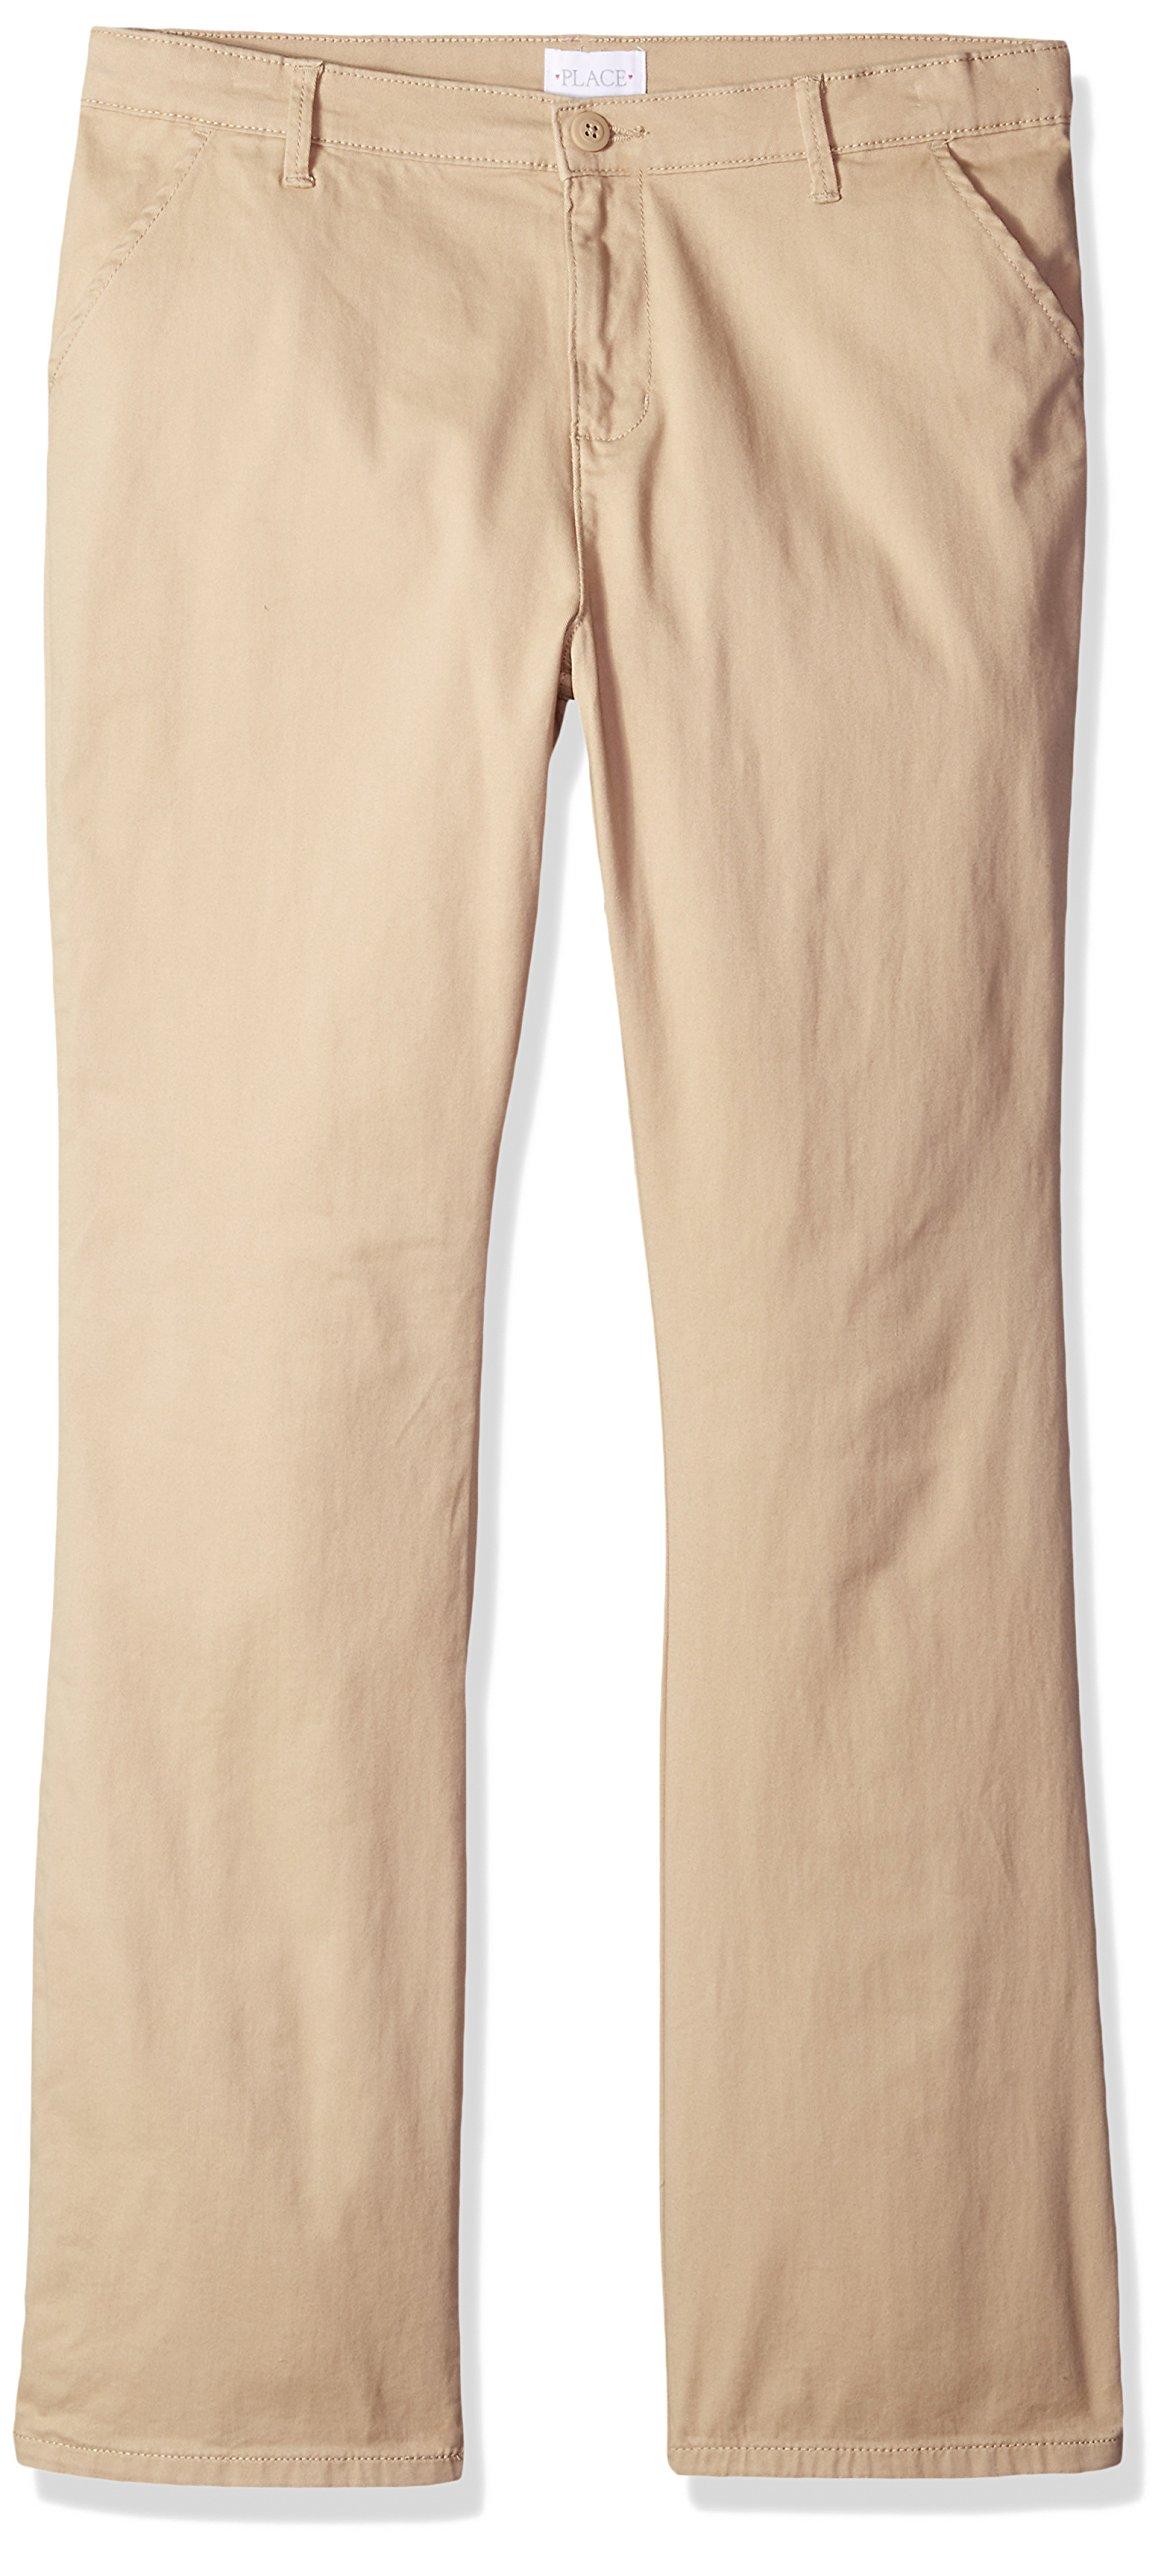 The Children's Place Big Girls' Skinny Pants, Sandy, 16P